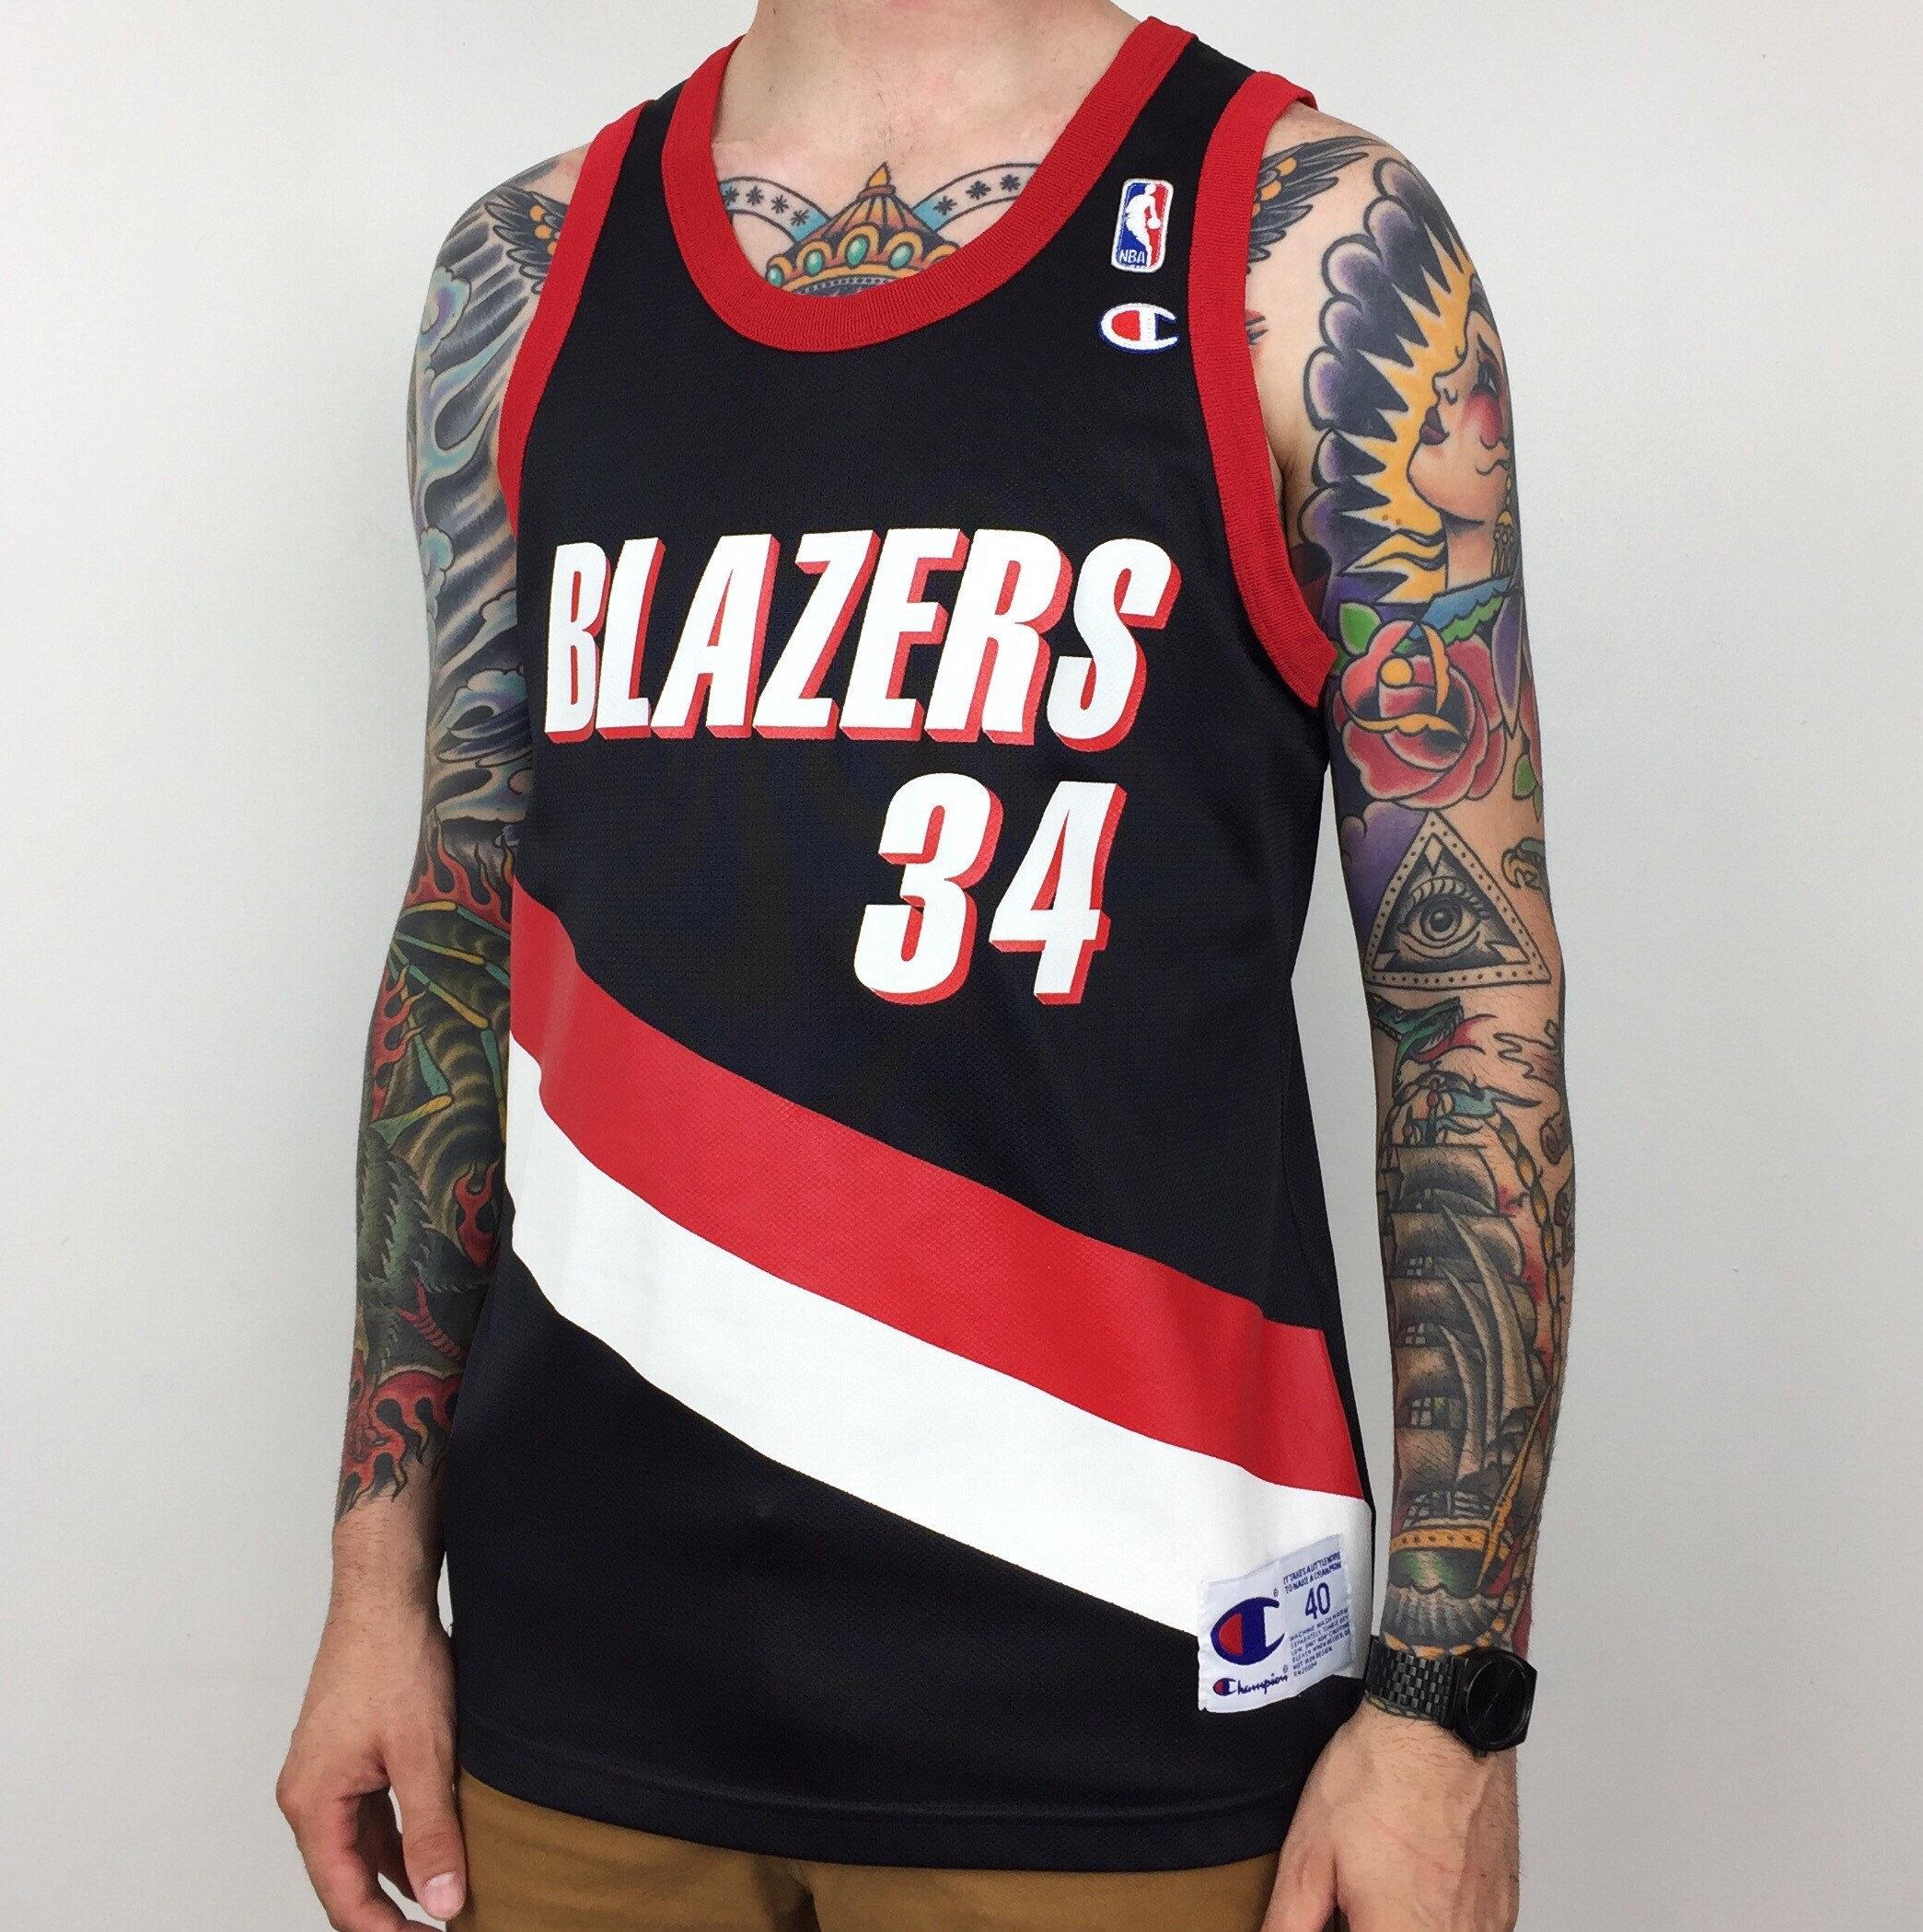 Asian Wearing Portland Blazer Jersey: RARE Vintage 90s Champion NBA Portland Trail Blazers